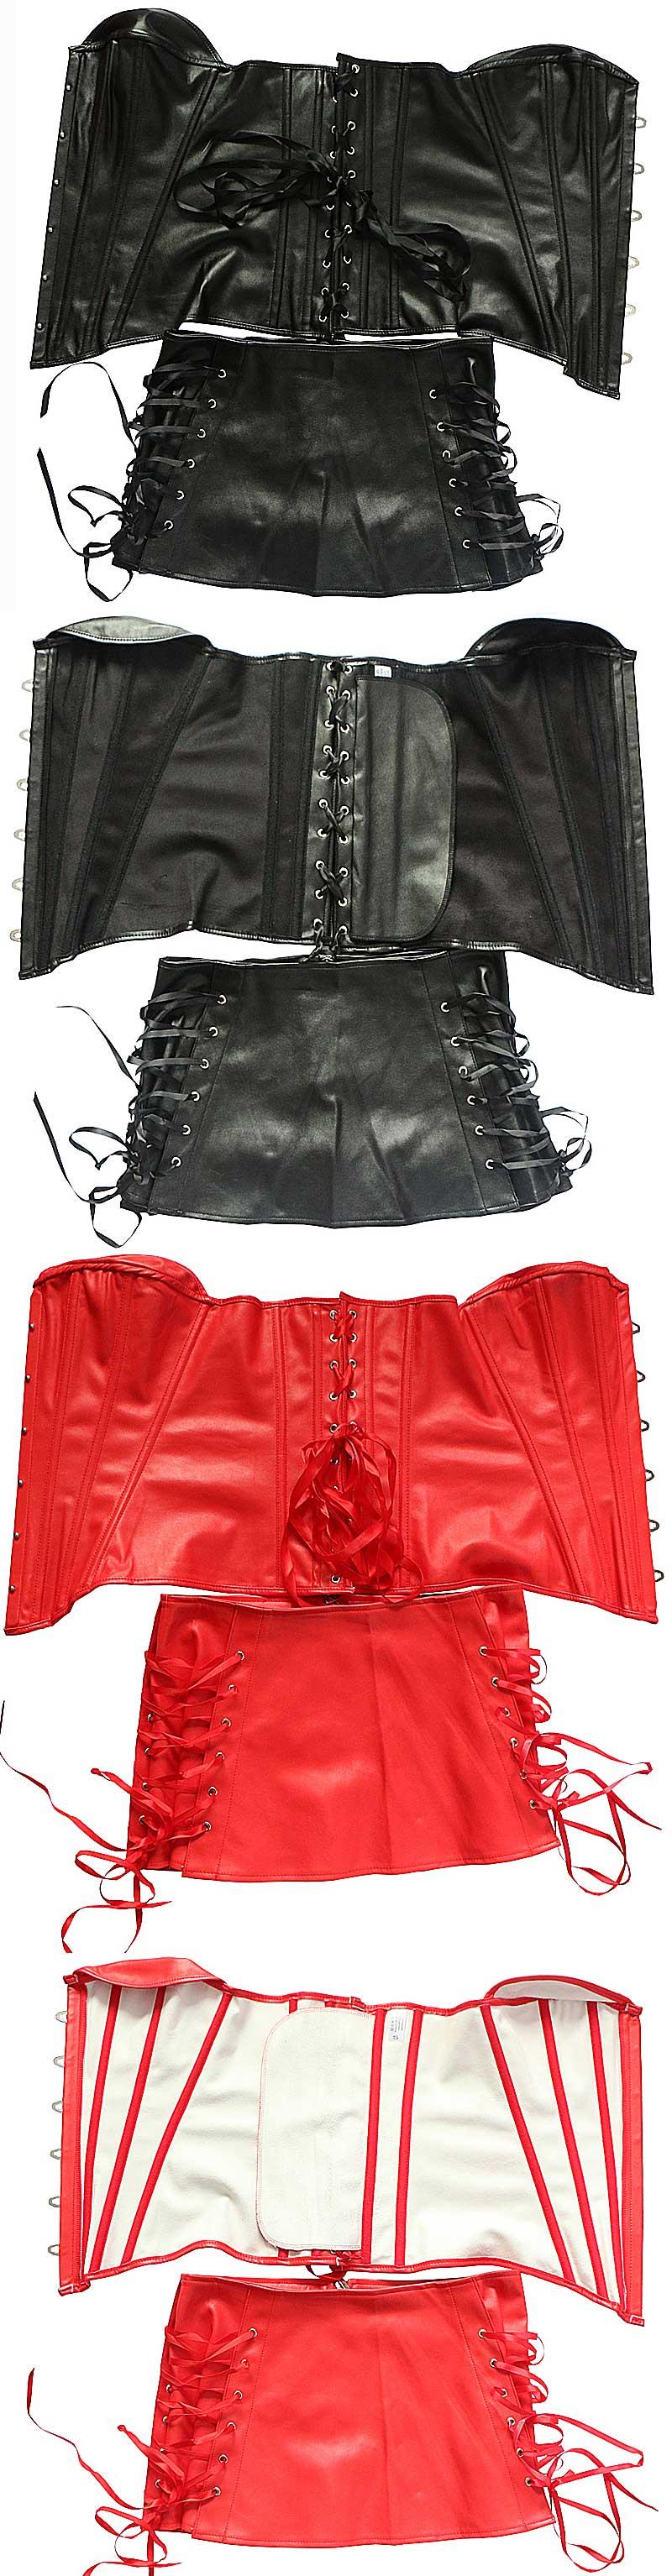 Red Faux Leather Corset Dress Suit Overbust Busiter Suit Plus Size Sexy Corselet Black Party Club Wear Fish Boned Gothic Korset 13